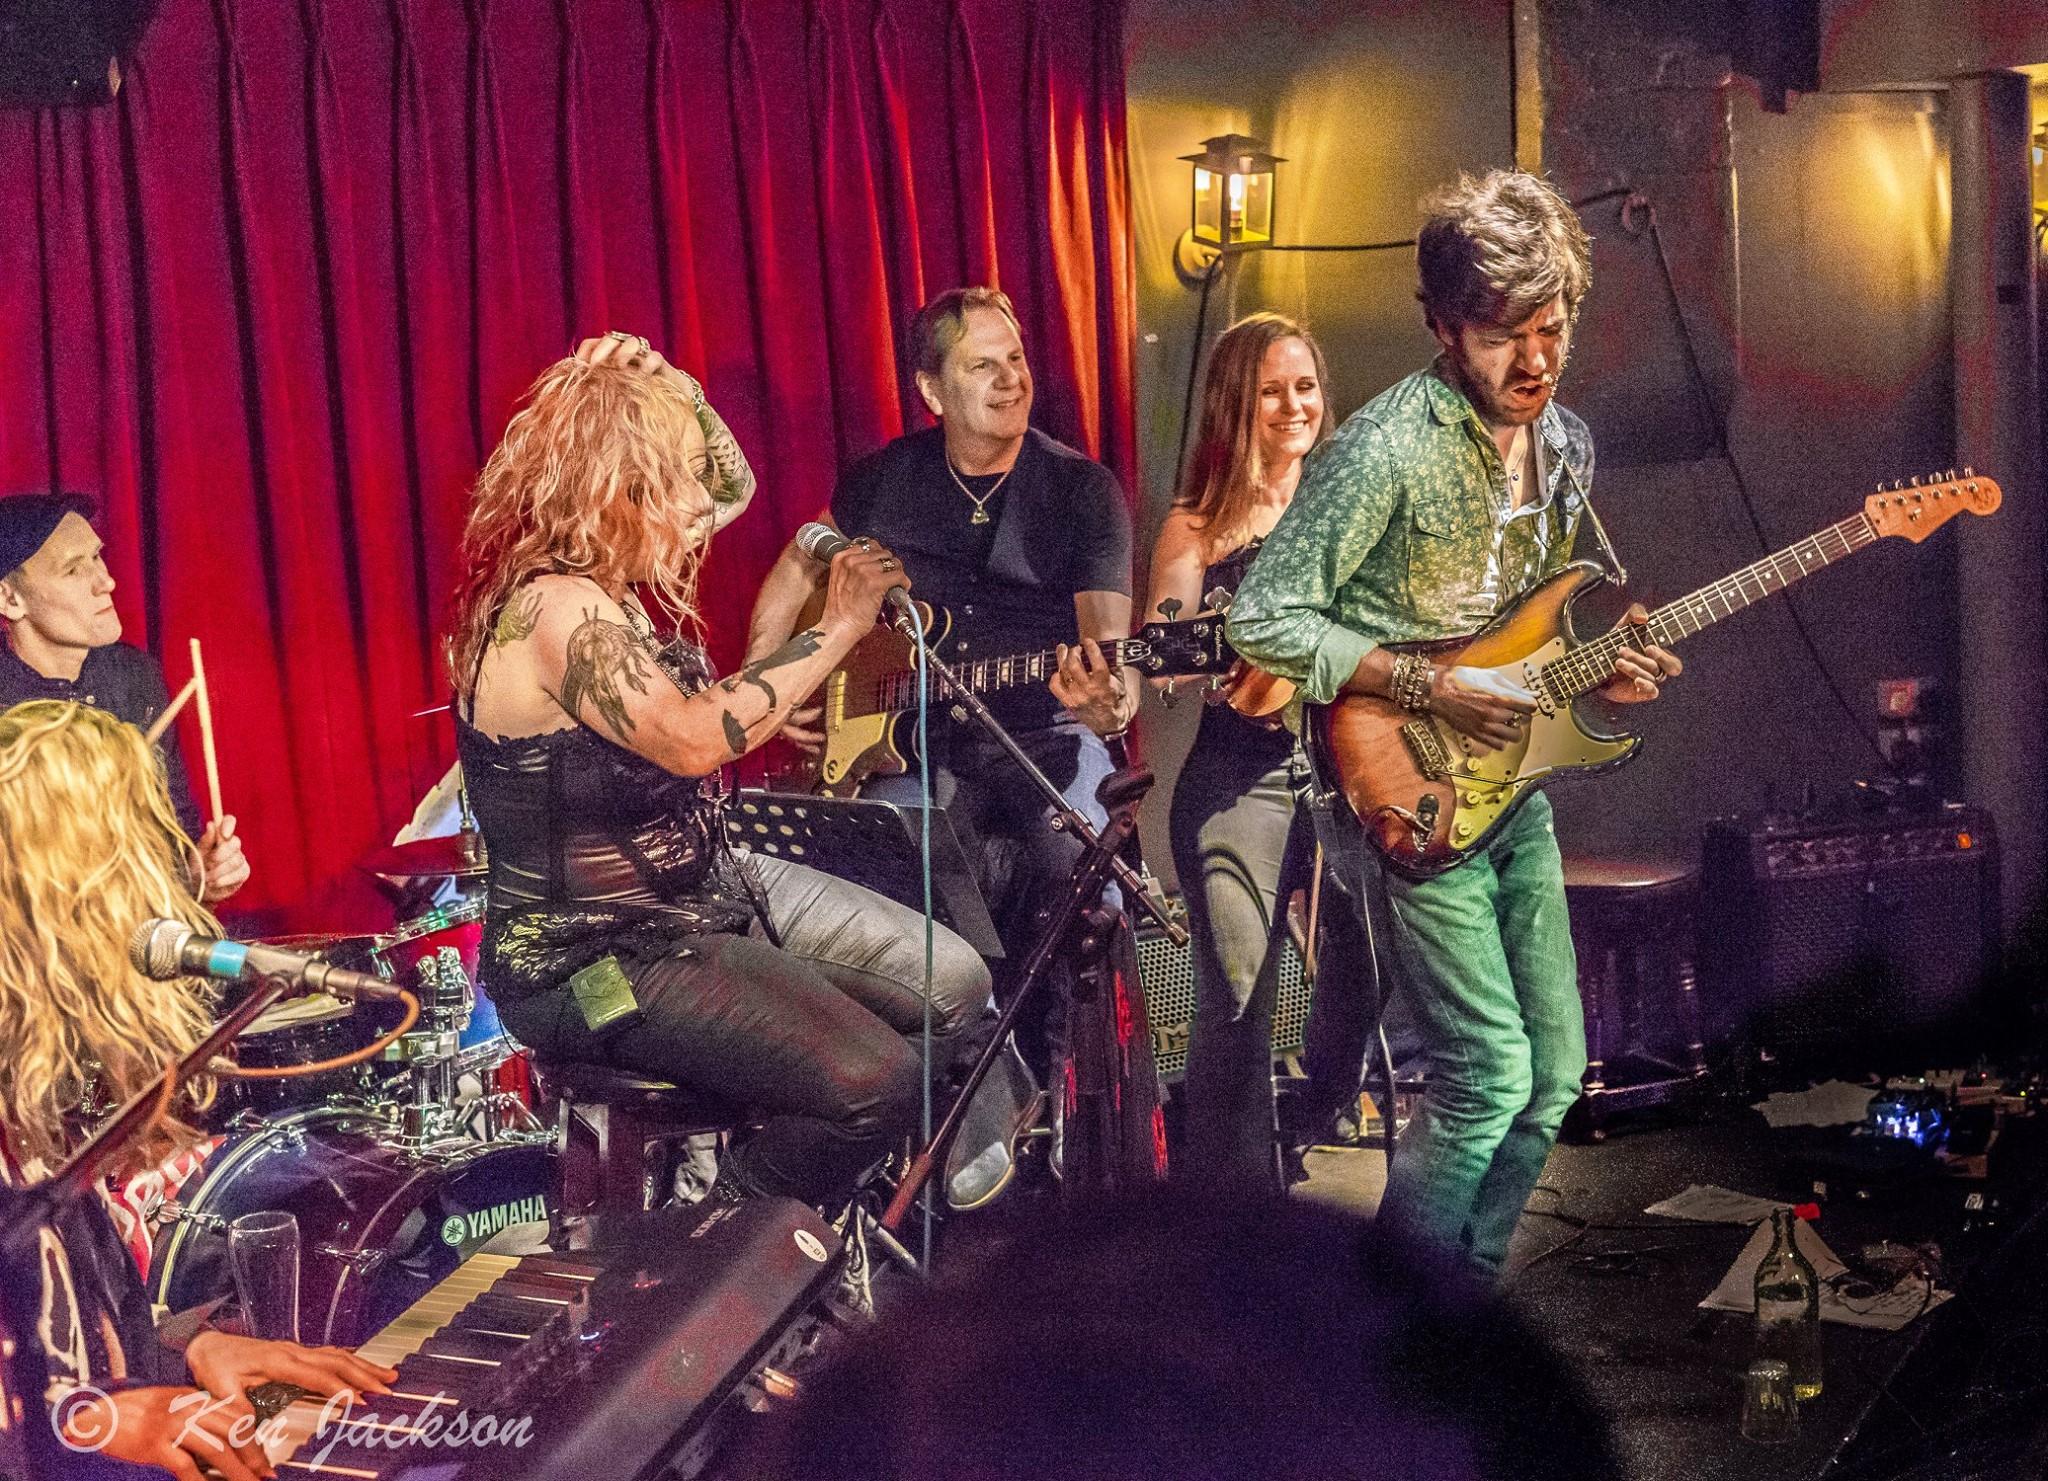 Maxime rocking it - Photo by Ken Jackson